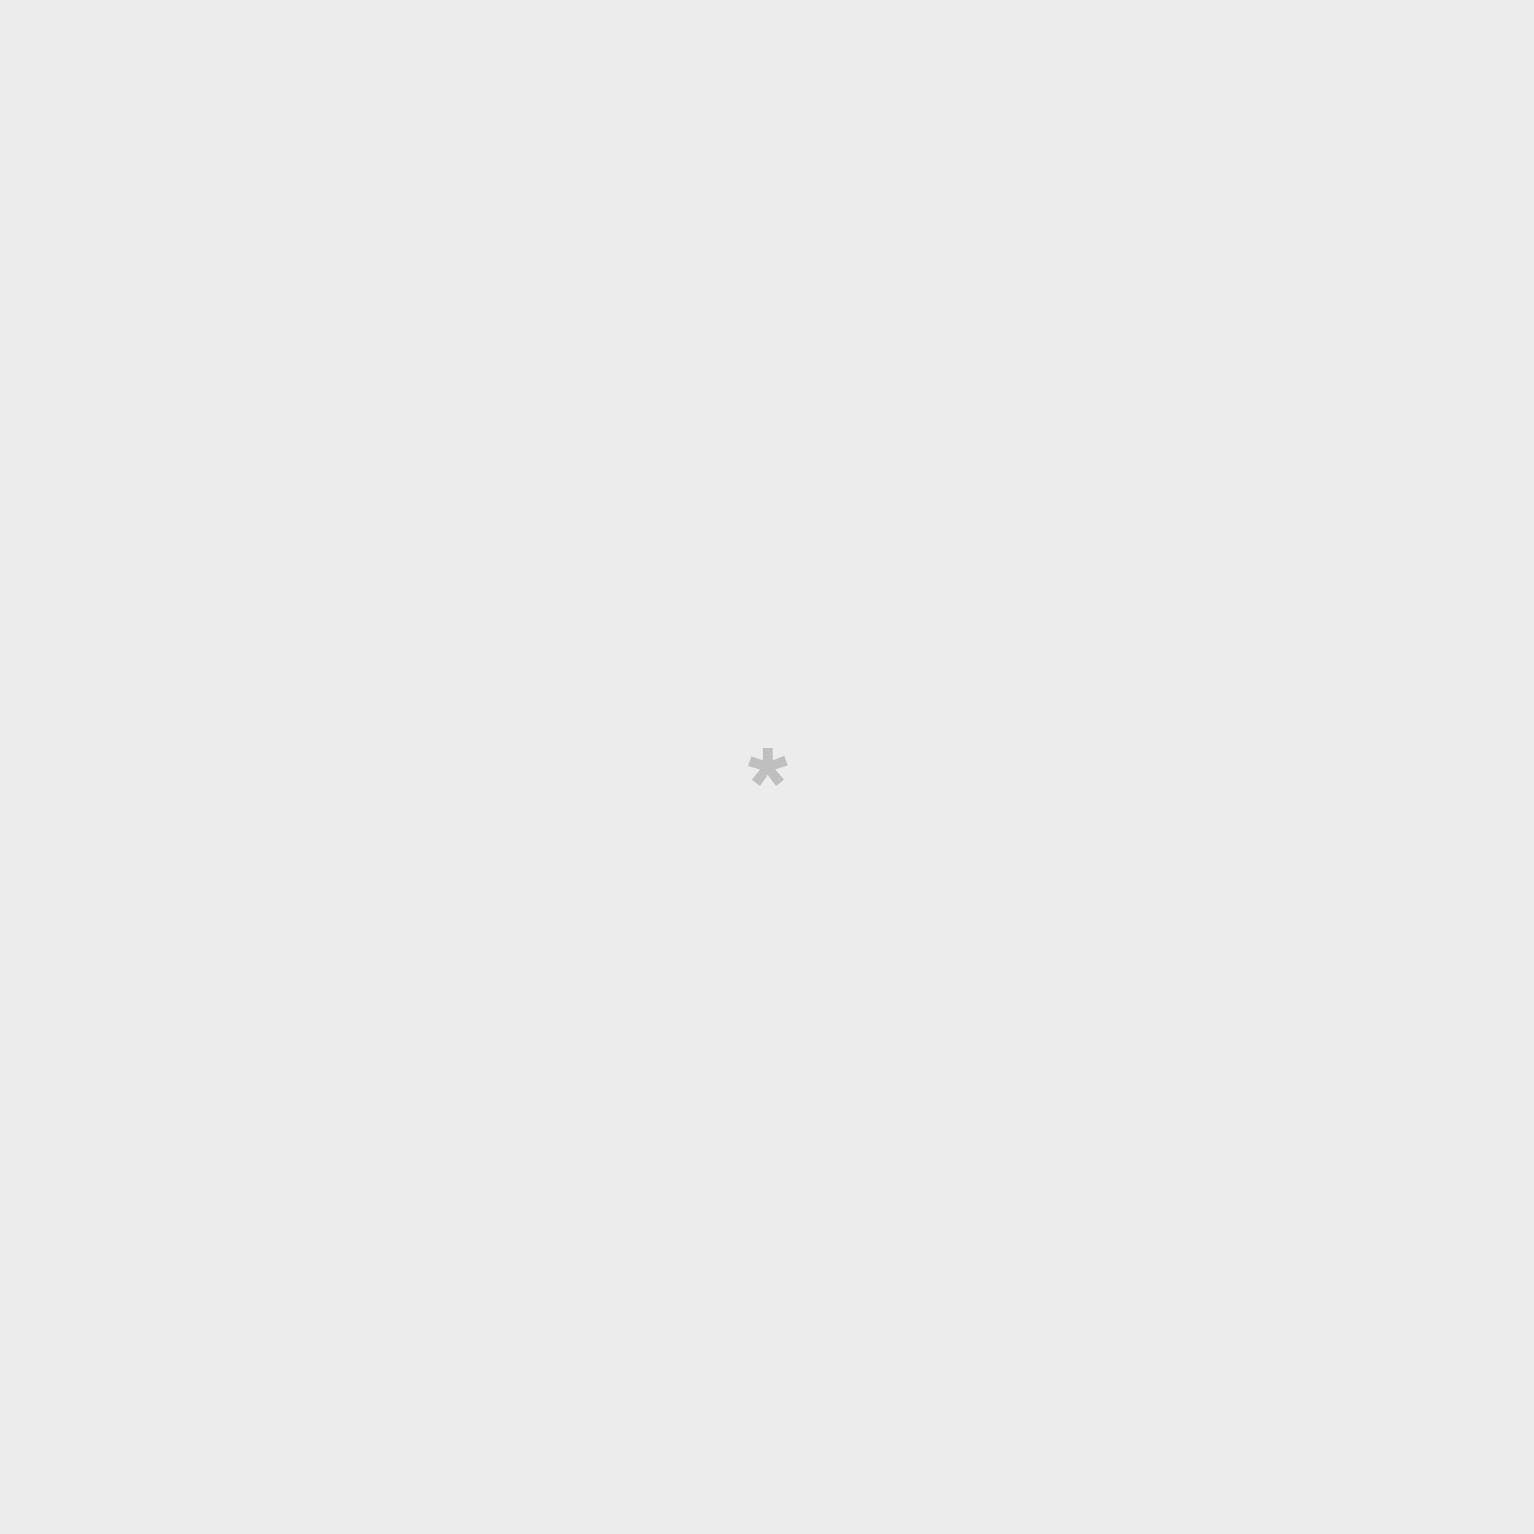 Drawstring bag - Make today a big day